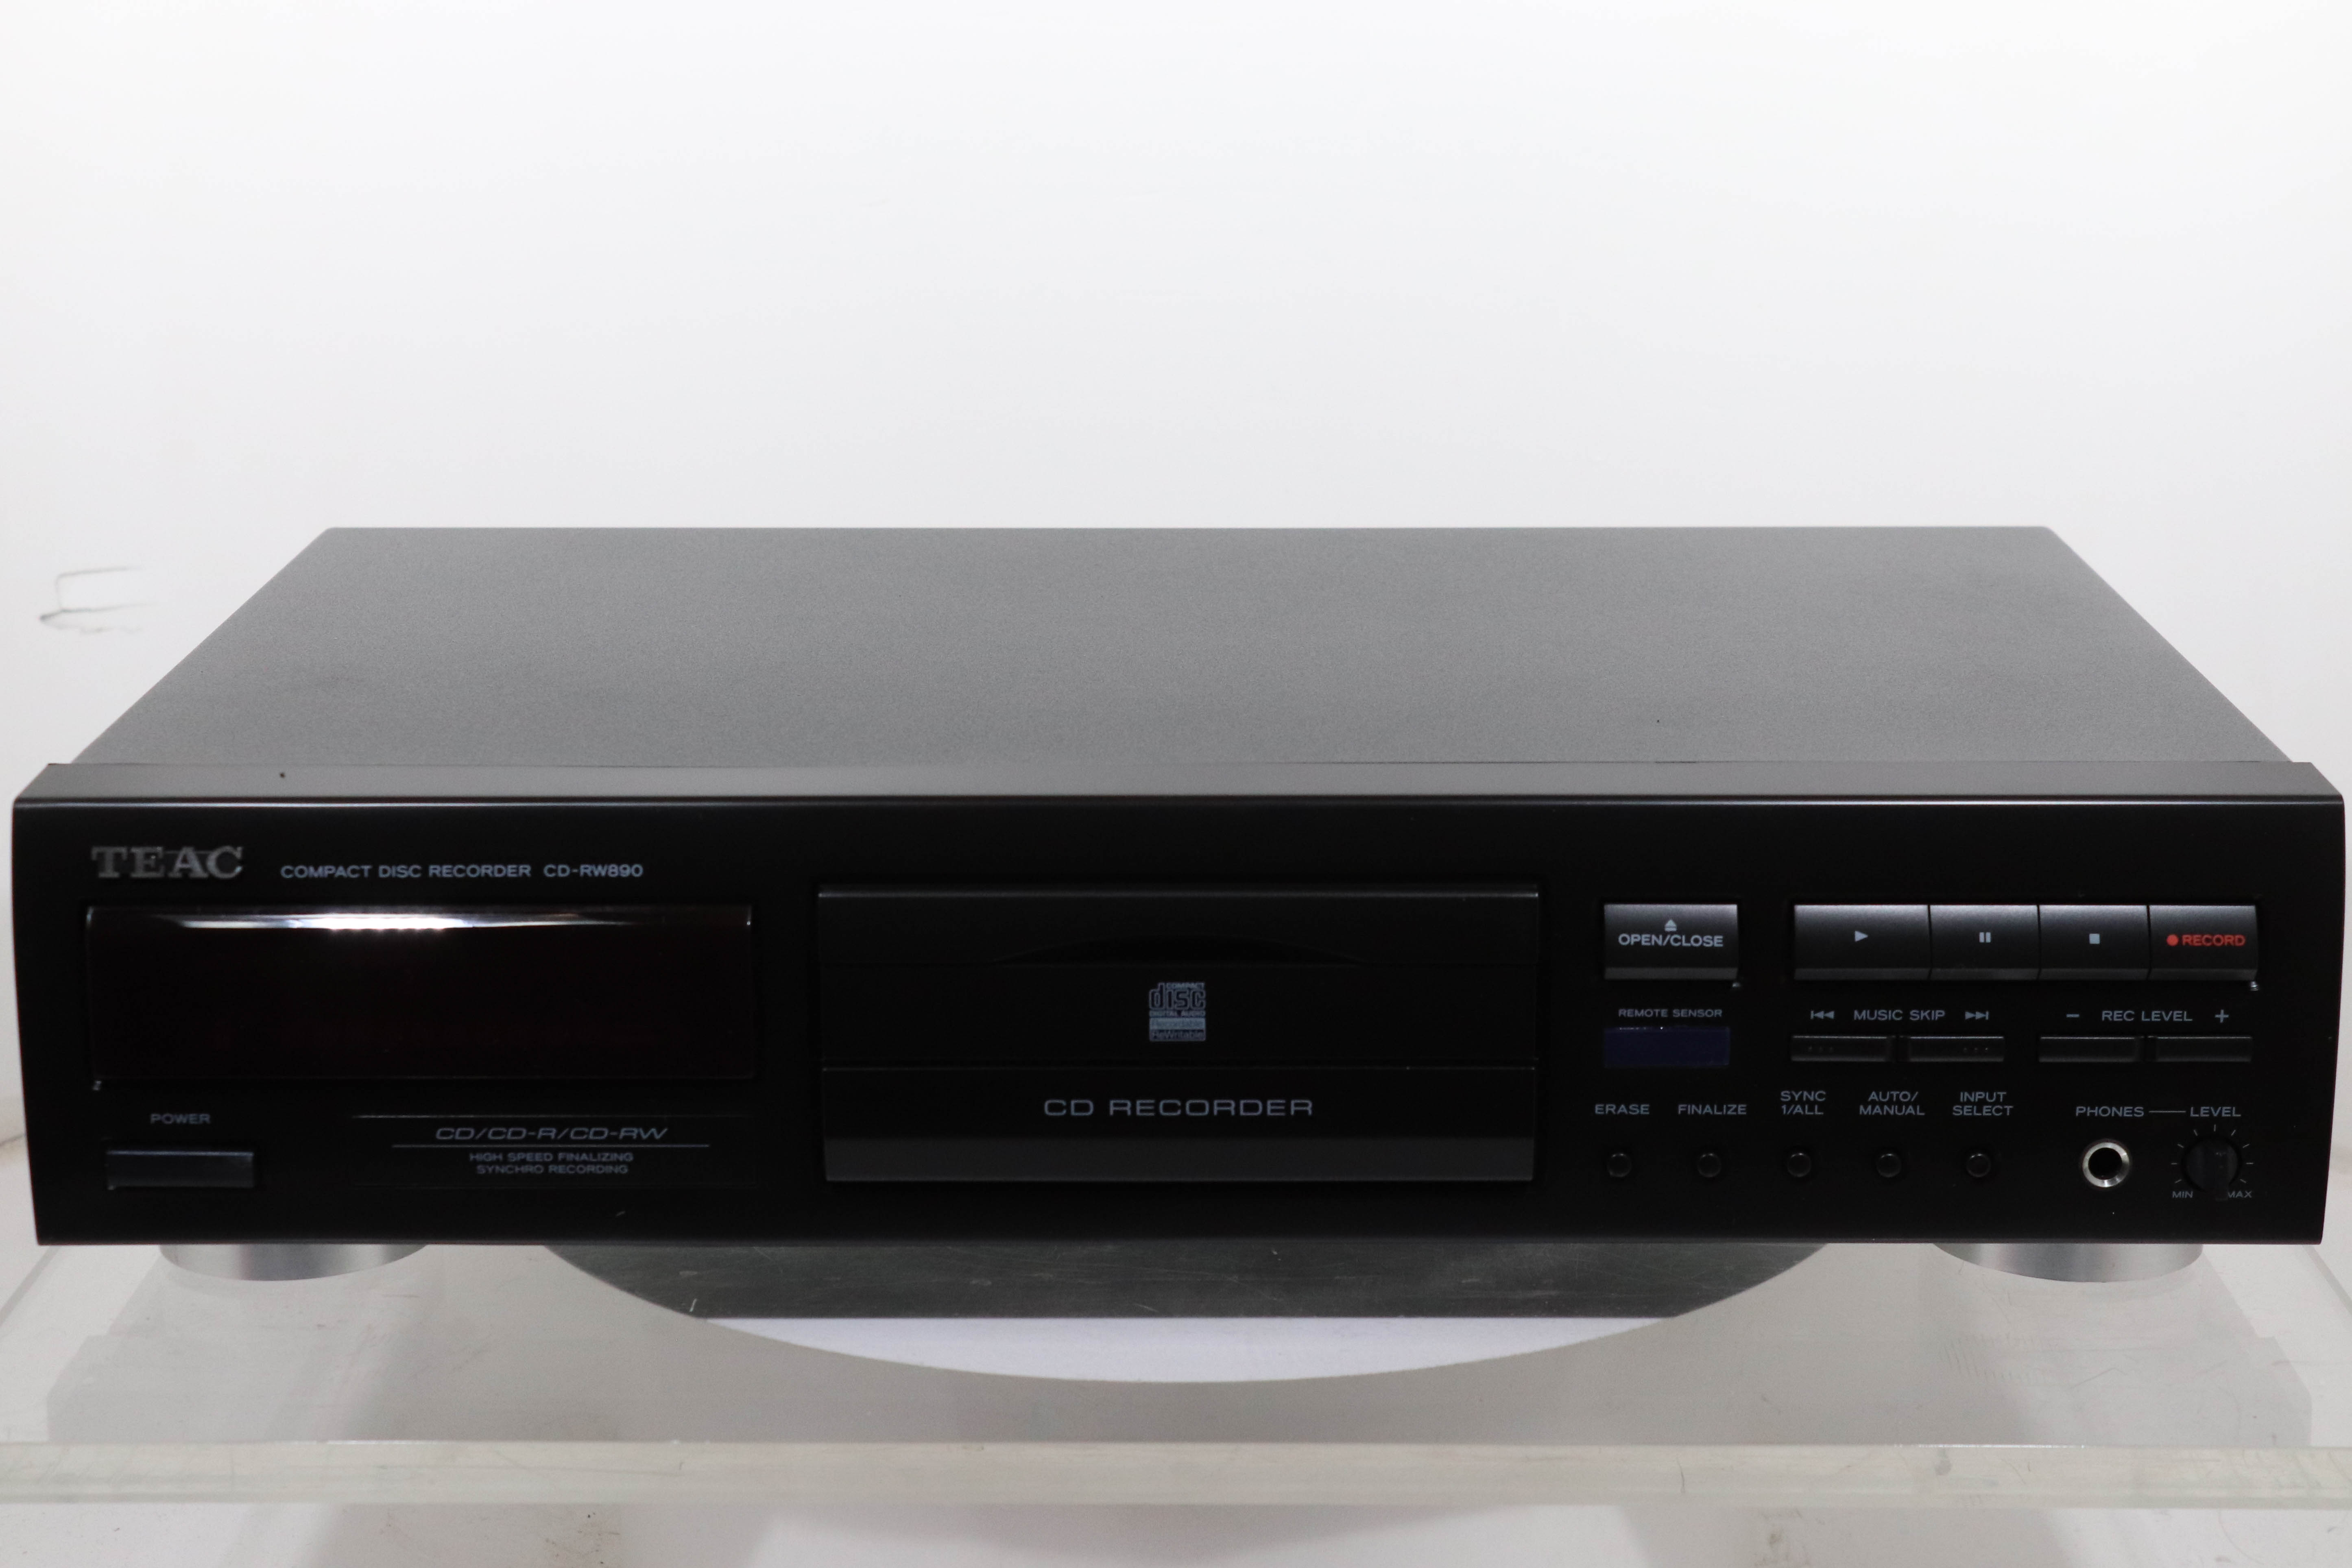 teac cd rw890 cd recorder 2ndhandhifi used hifi rh 2ndhandhifi co uk Audio CD Recorders Sale CD Recorders Walmart